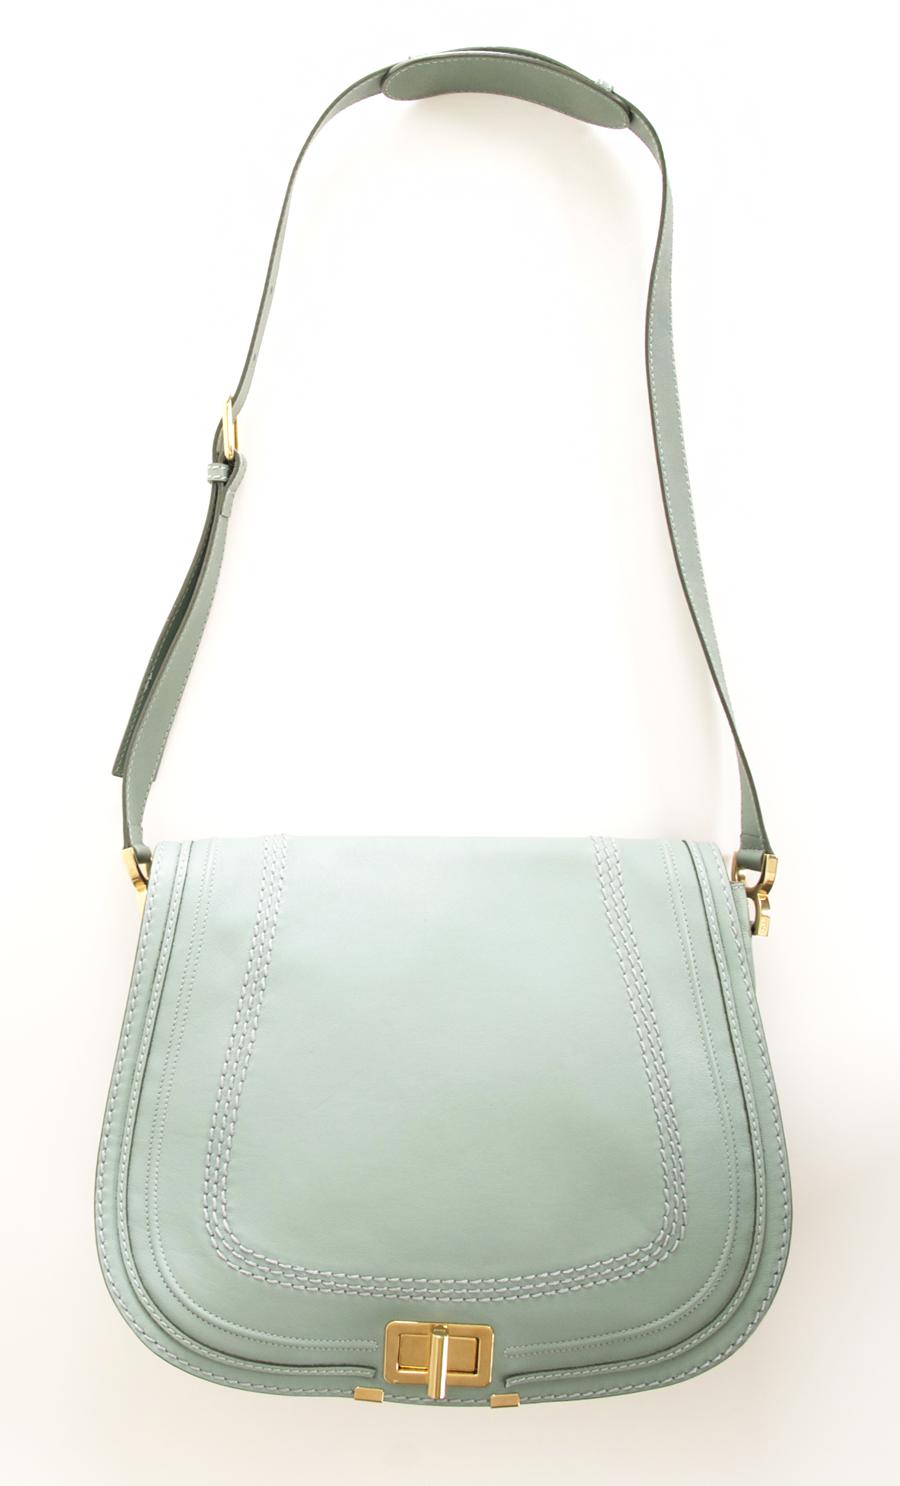 CHLOE SHOULDER BAG @Michelle Flynn Flynn Flynn Flynn Flynn Coleman-Hers  Stunning Chloe Marcie Cross Body hand bag!  Price: $1,195  Price when purchased: 1,895